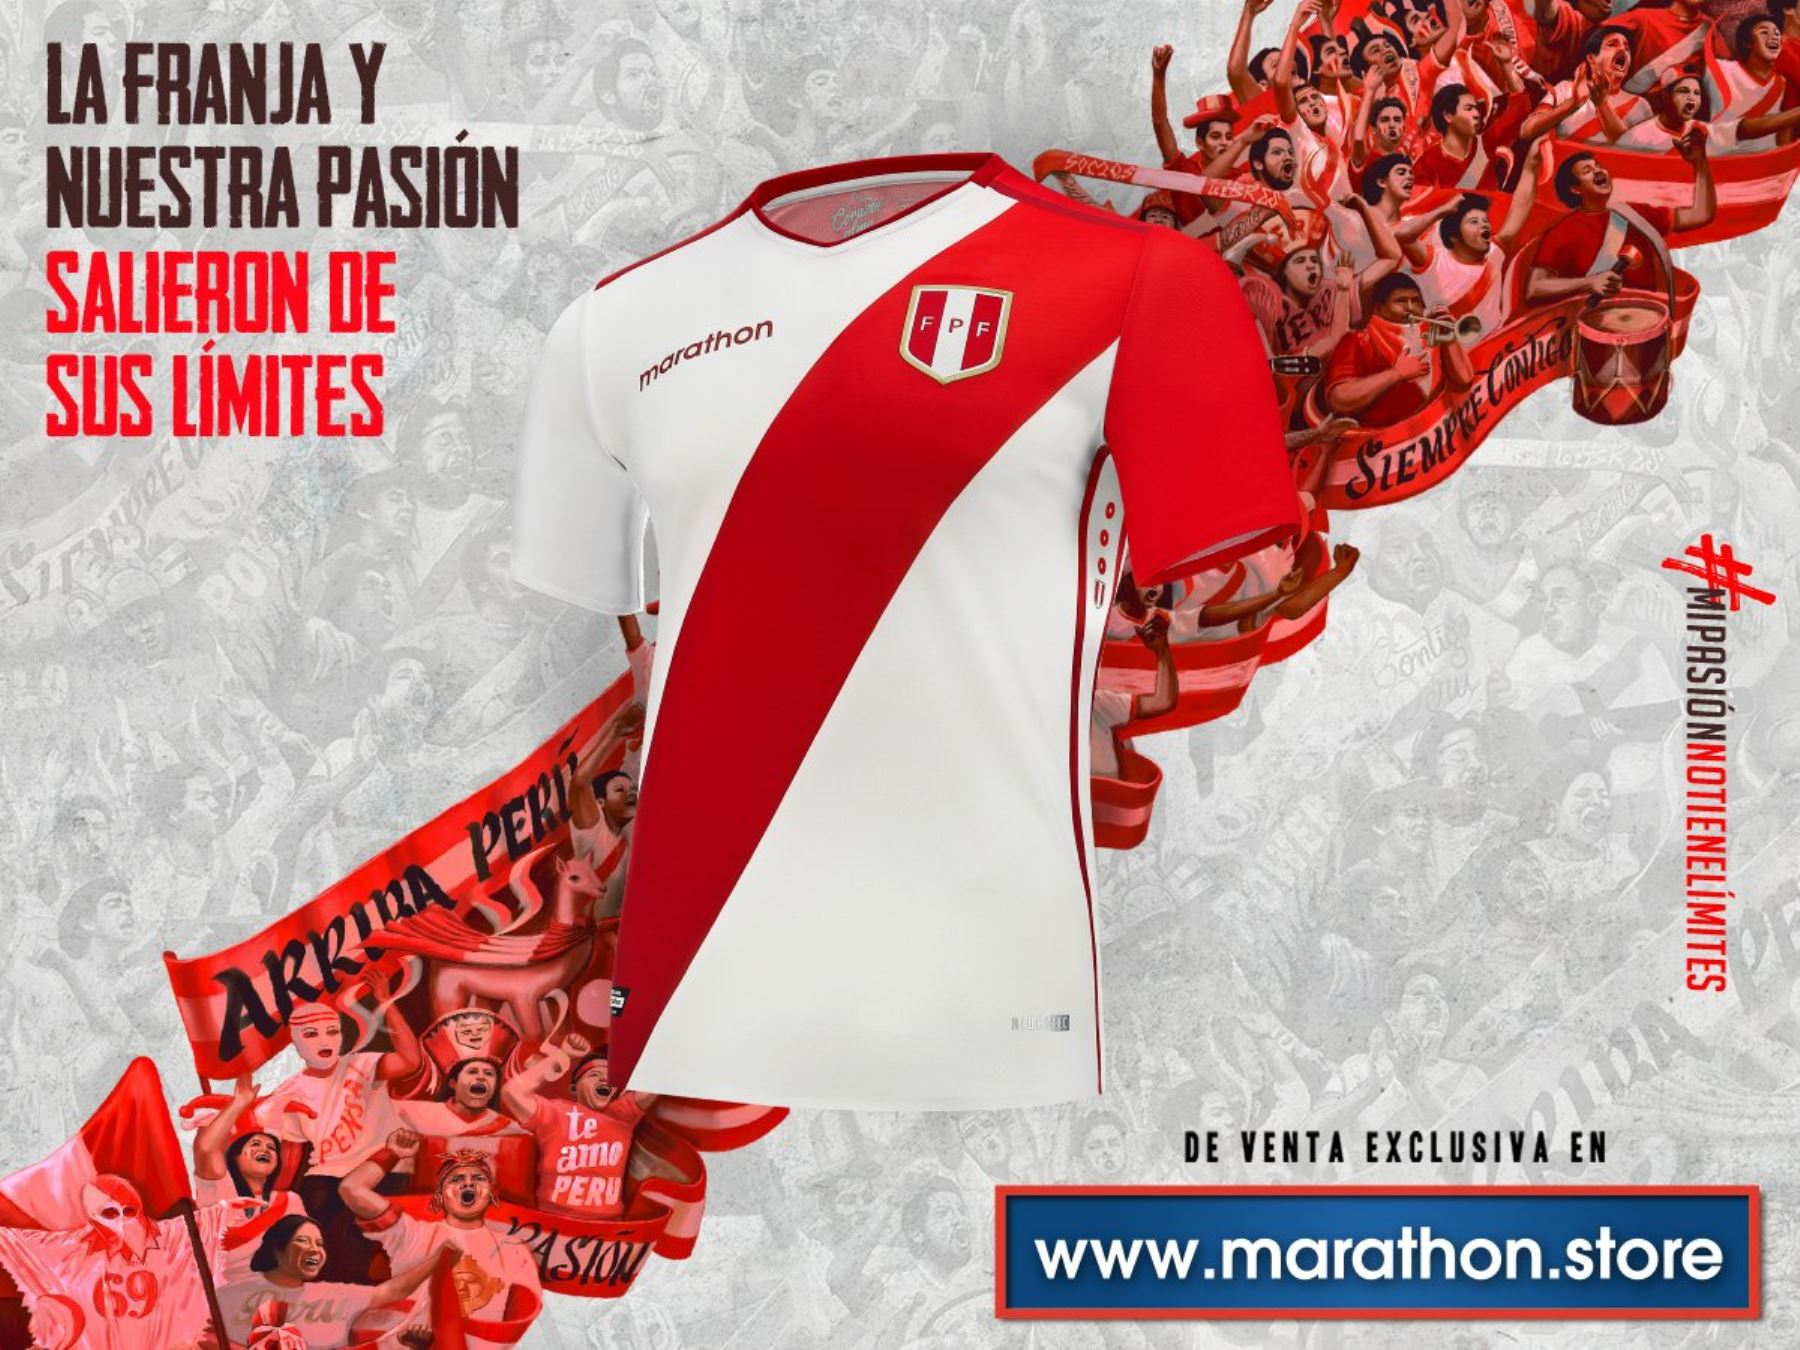 c82afe8c1c9 Marathon unveils Peru's new soccer jersey | News | ANDINA - Peru ...